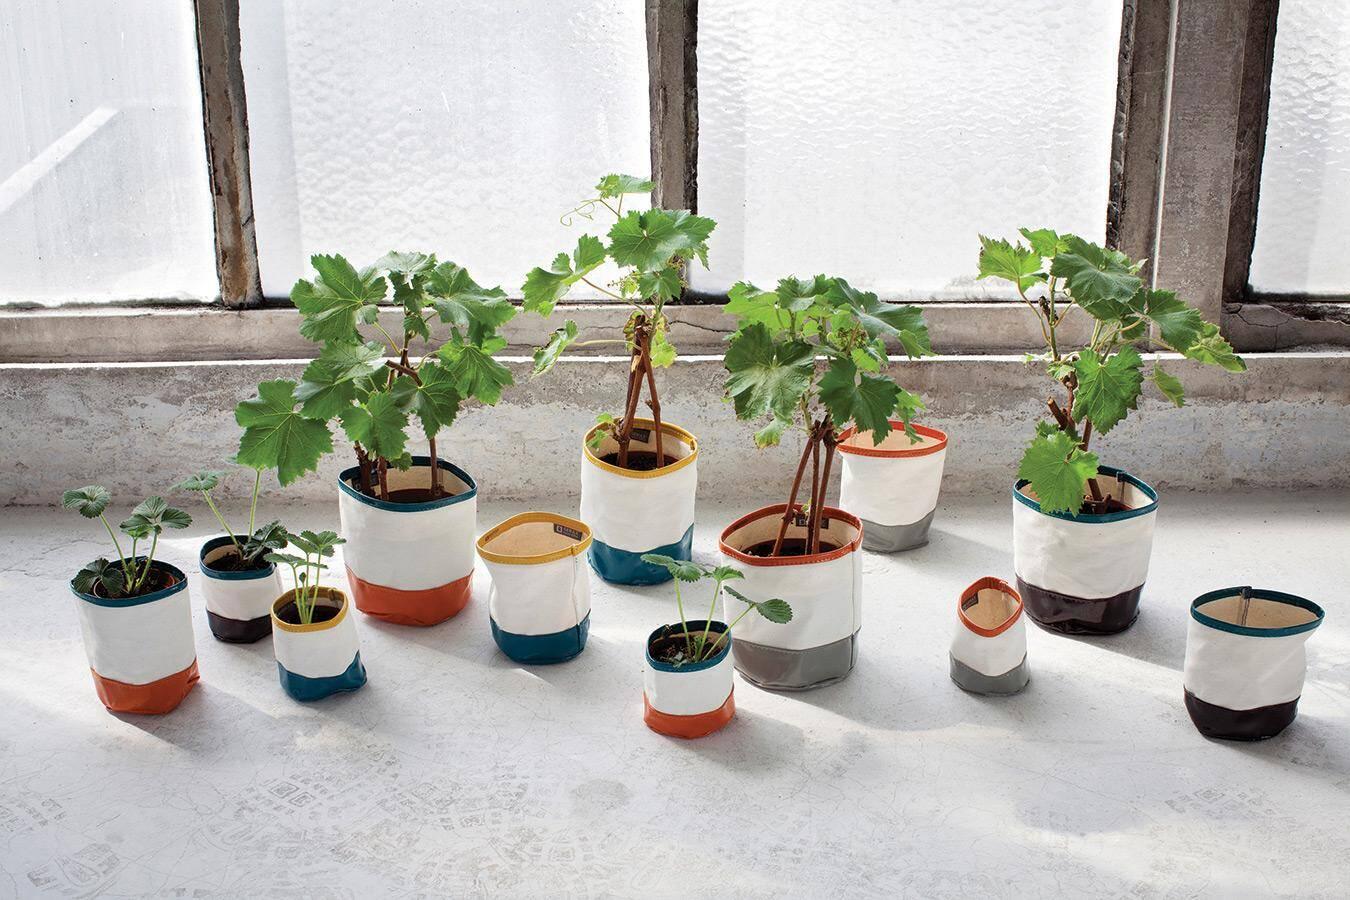 Serax - Flower pots can transform any garden or interior (5)